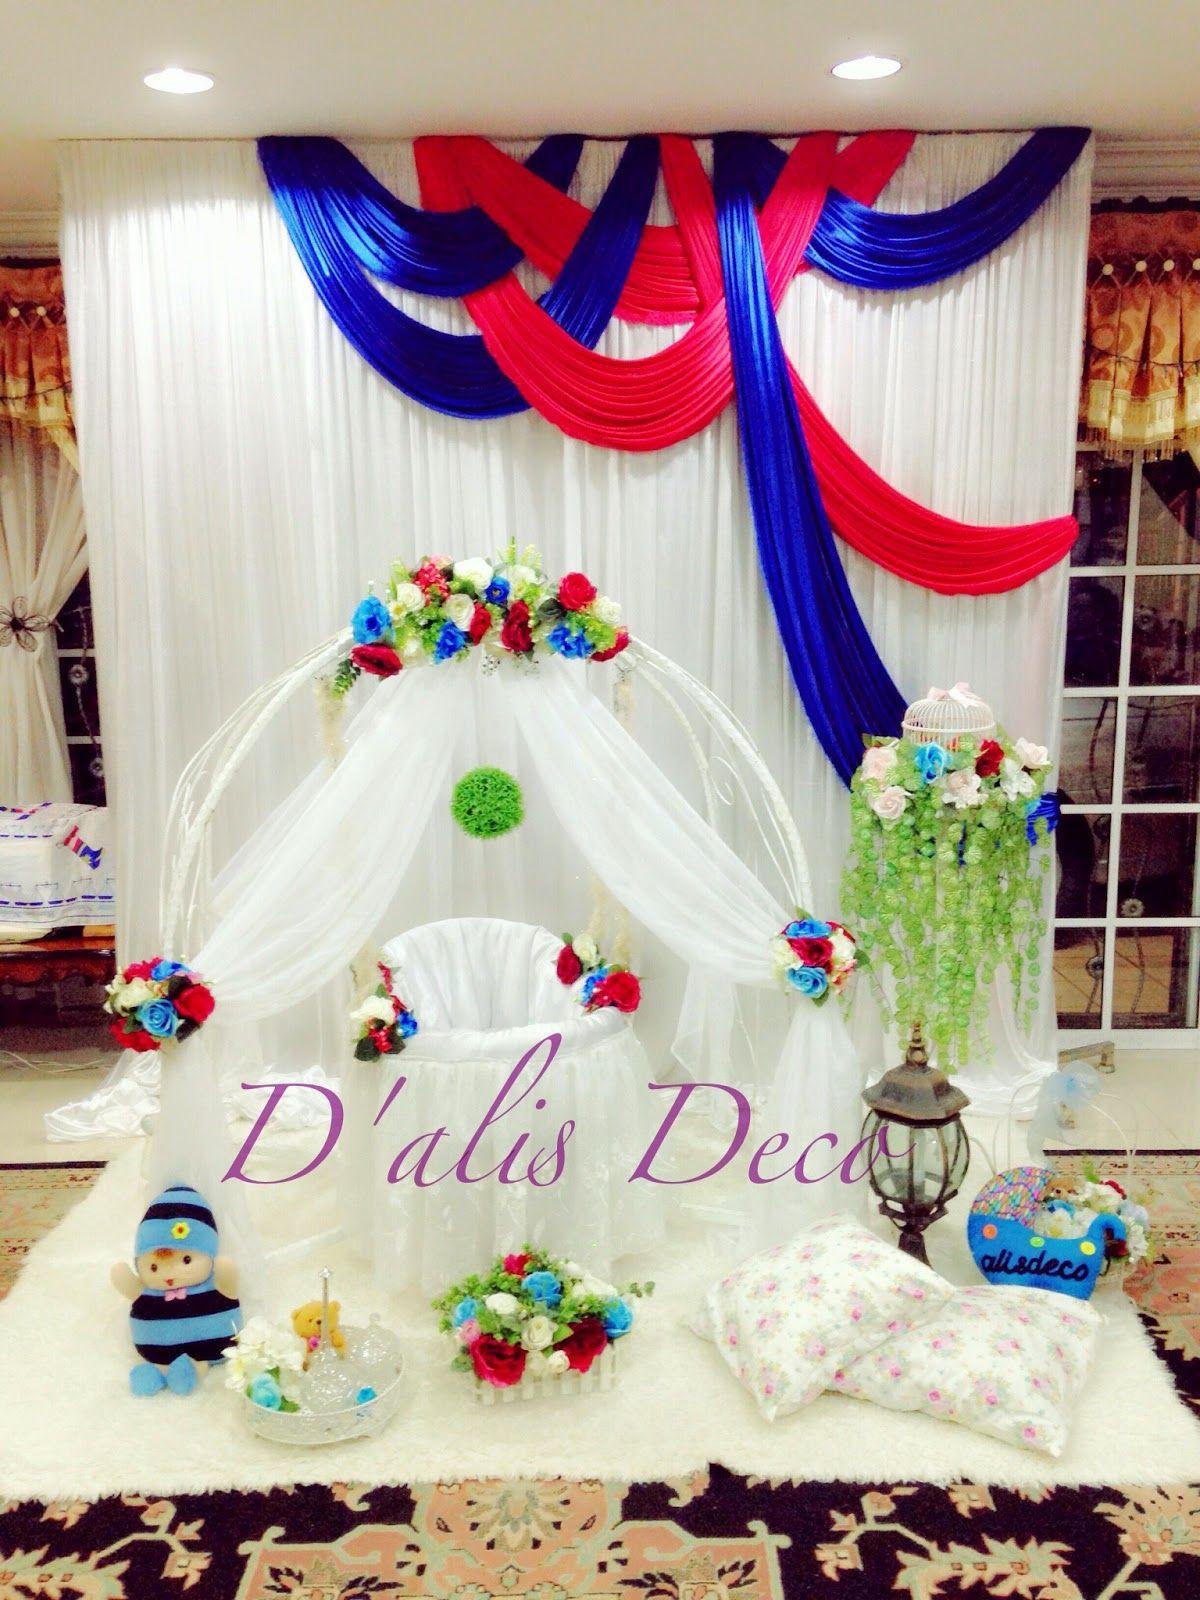 D'alis Deco: Baby Raiyana